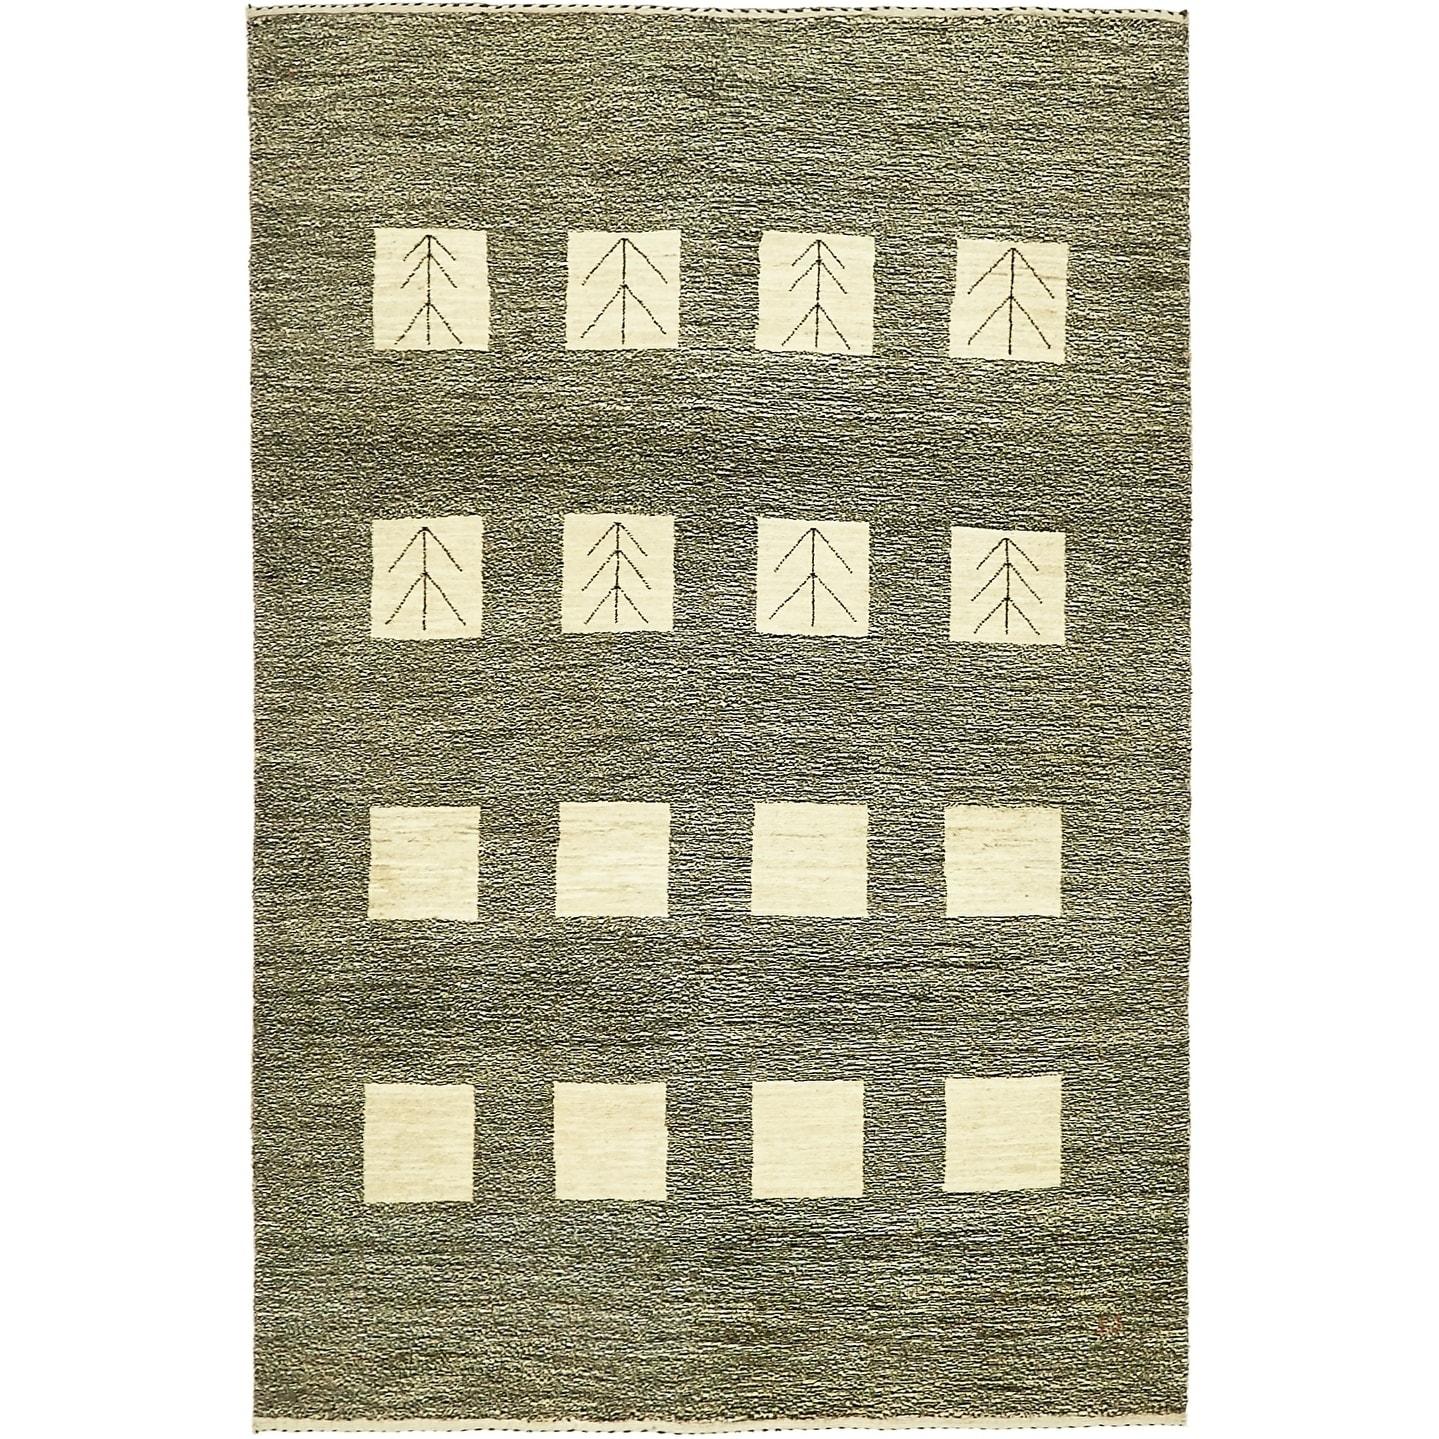 Hand Knotted Kashkuli Gabbeh Wool Area Rug - 4 x 6 (Brown - 4 x 6)